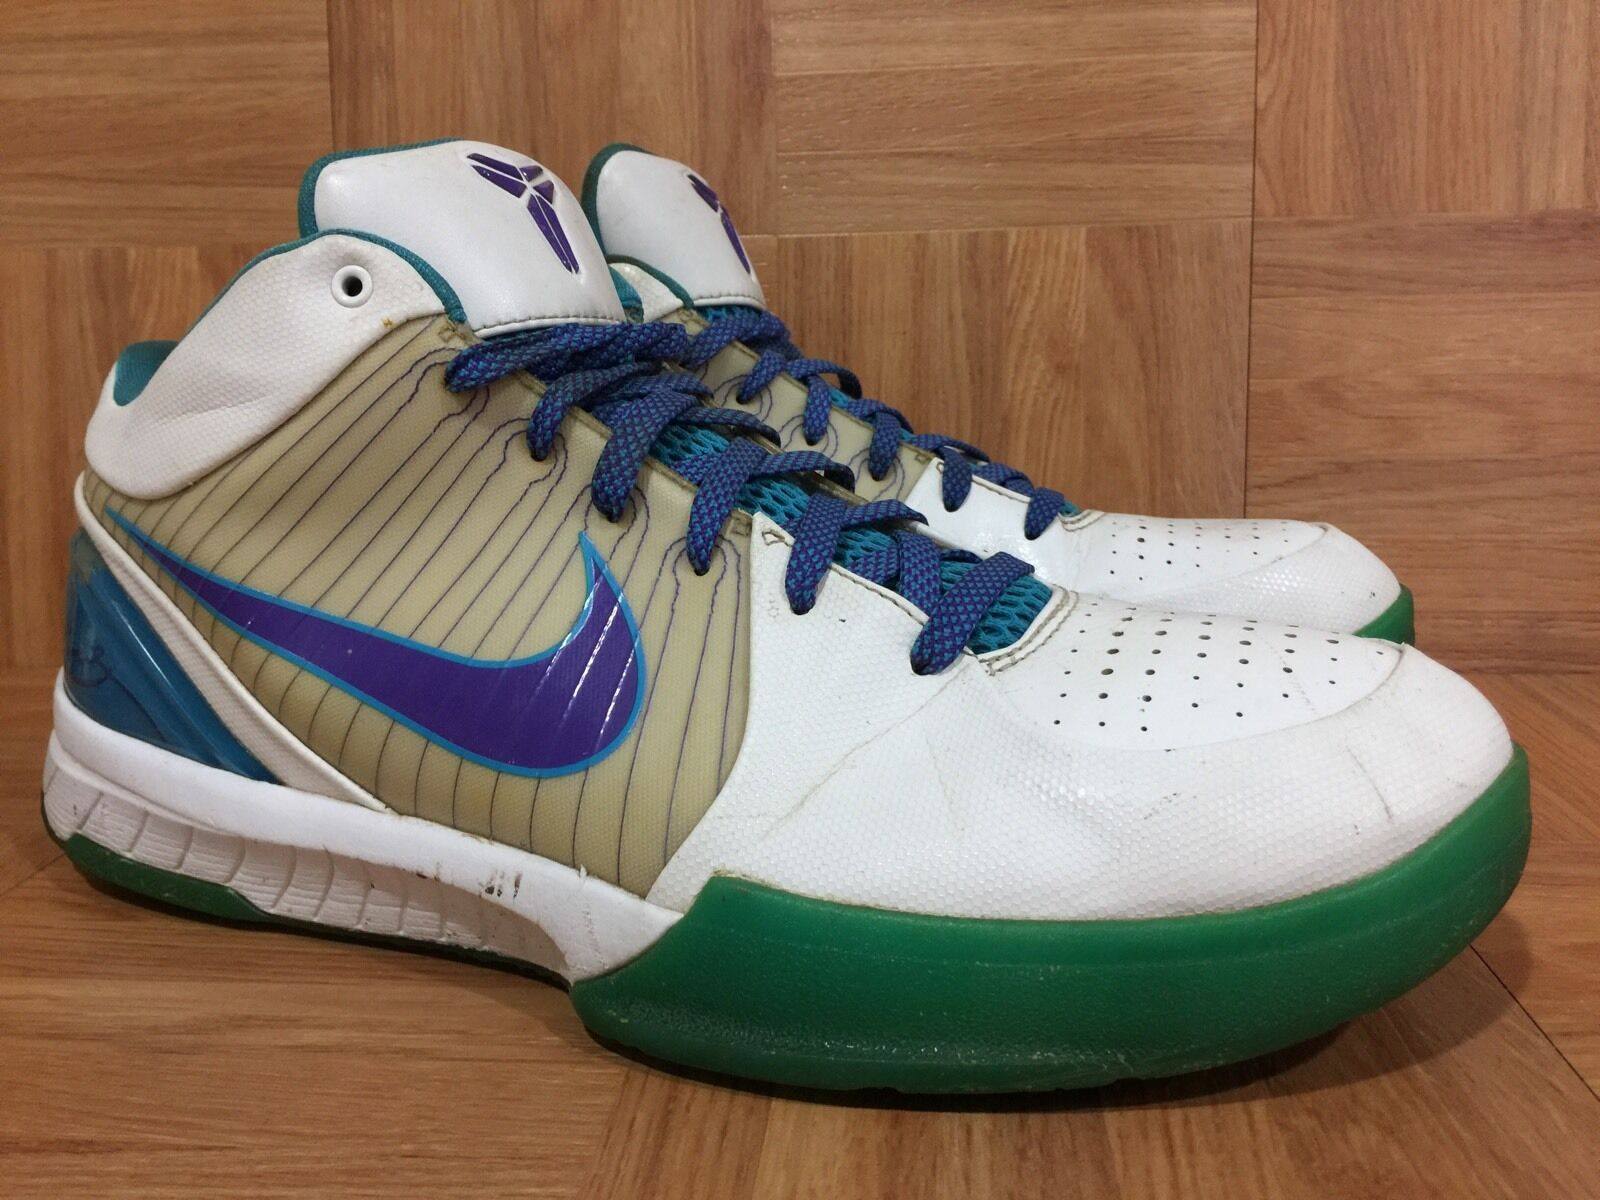 VTG Nike Zoom Kobe 4 IV Draft Day Hornets Orion bluee Purple Sz 12 344335-151